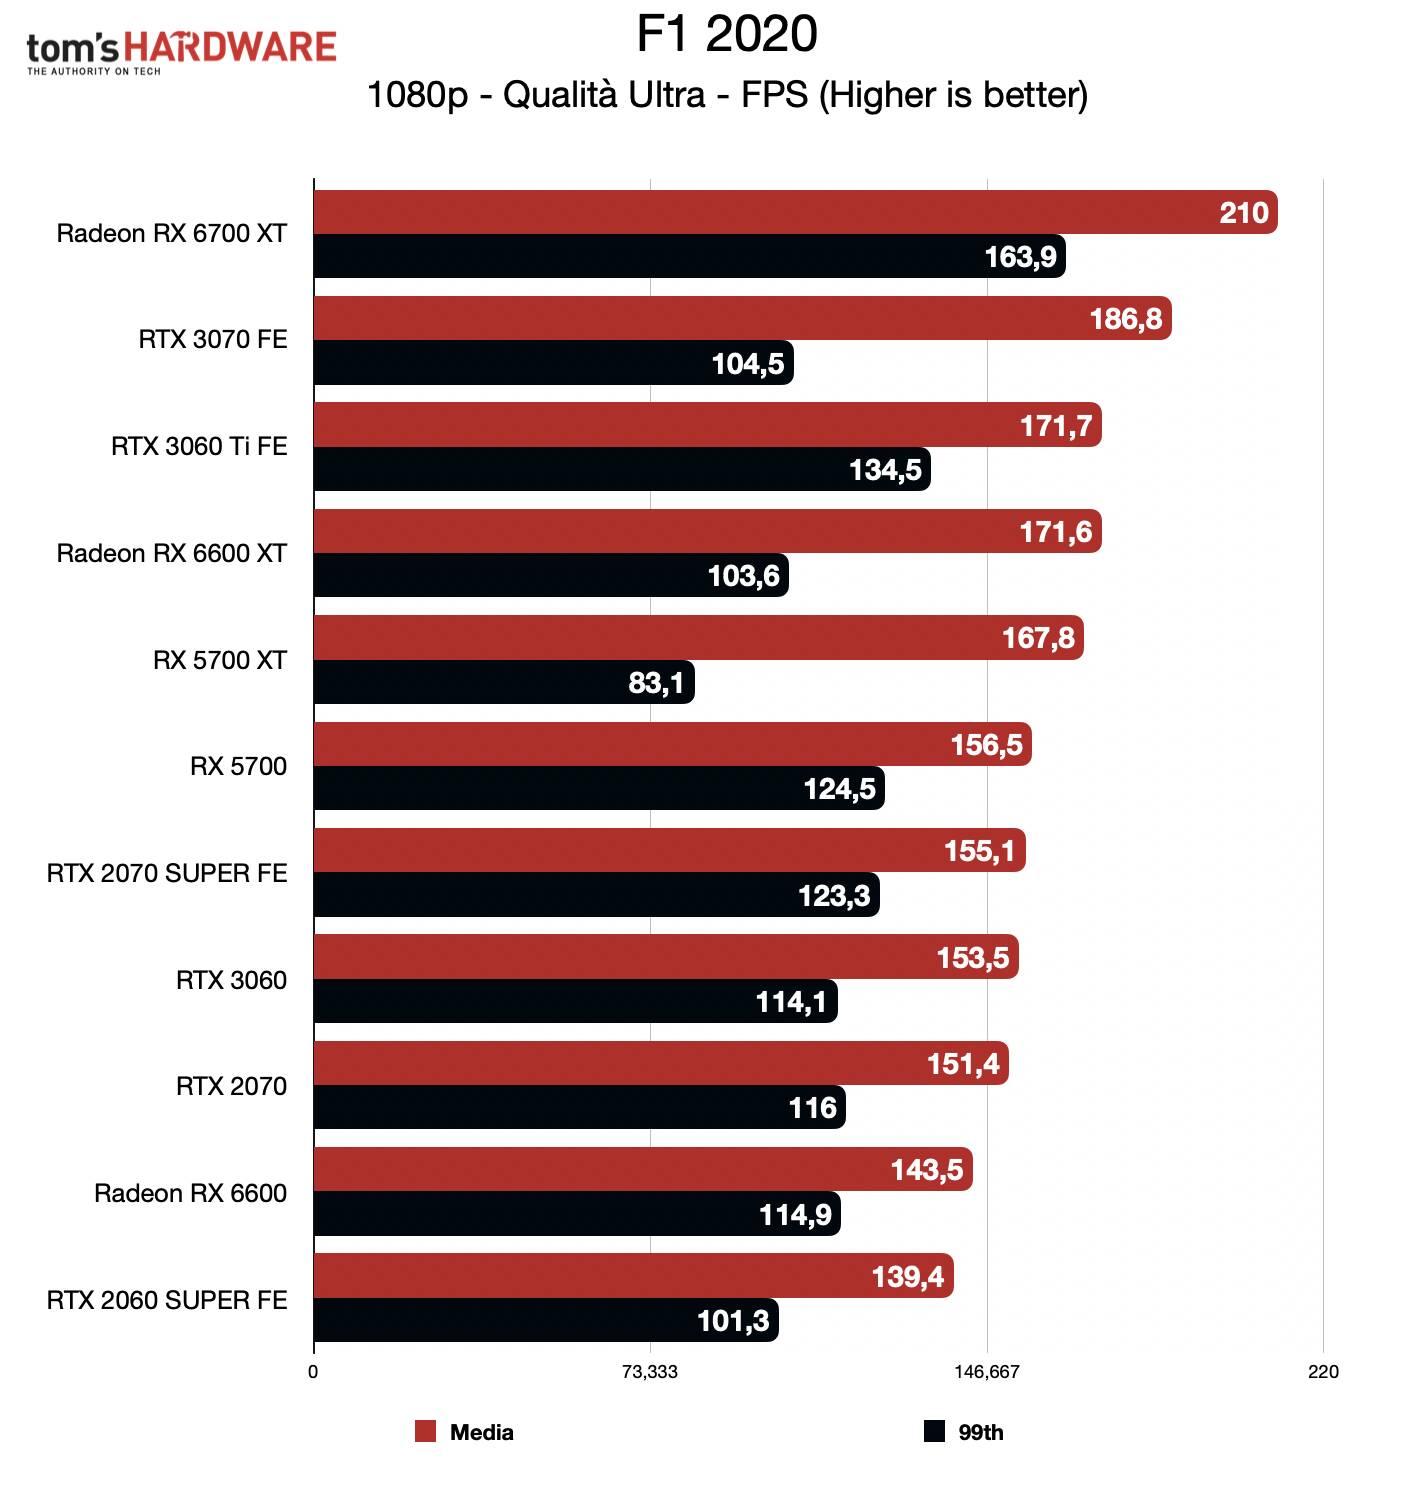 Benchmark Radeon RX 6600 - FHD - F1 2020